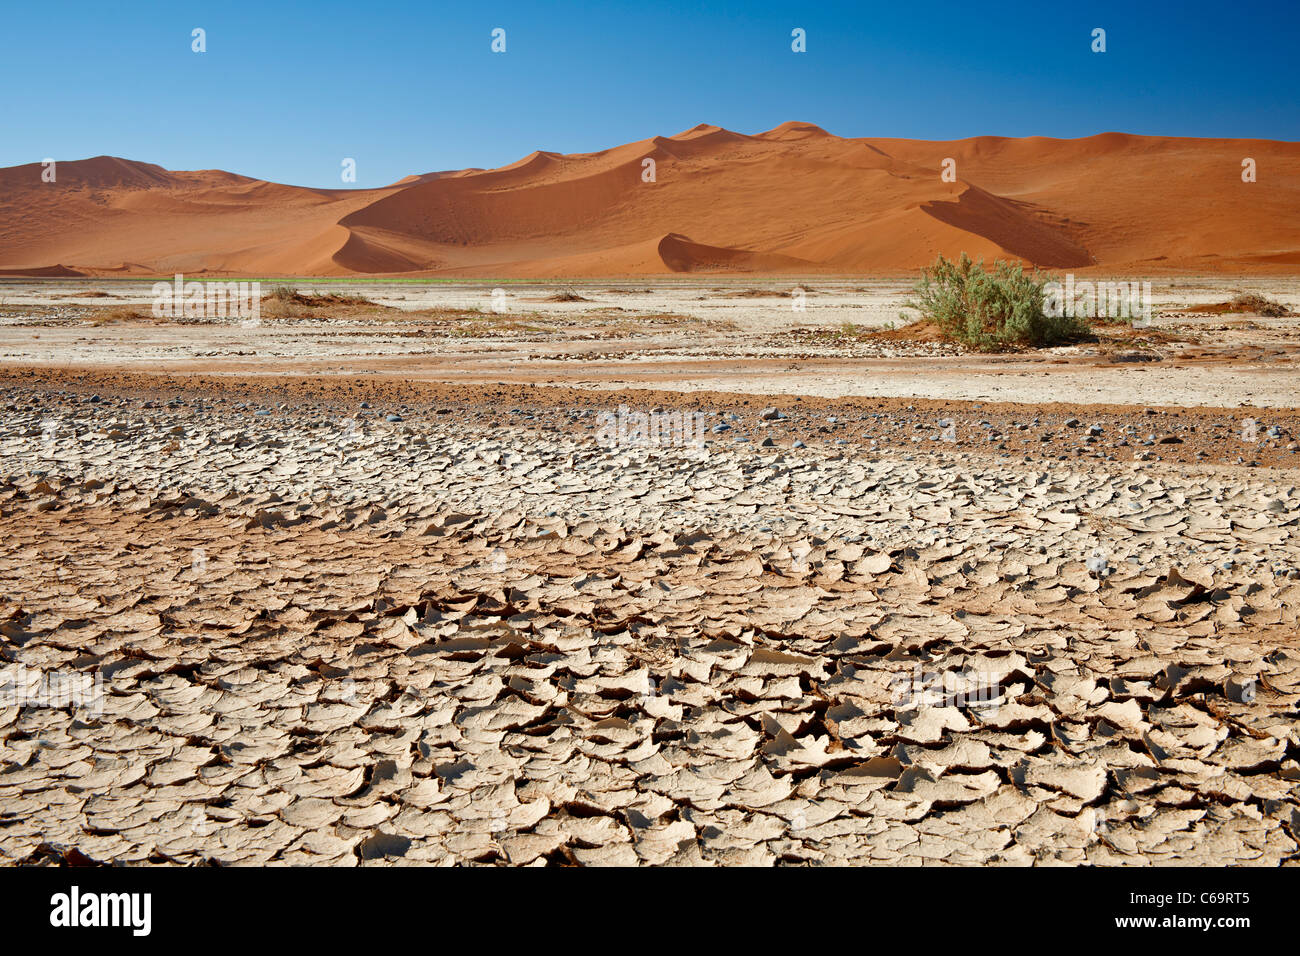 parched bursted ground and dunes in desert landscape of Namib at Sossusvlei, Namib-Naukluft National Park, Namibia, - Stock Image